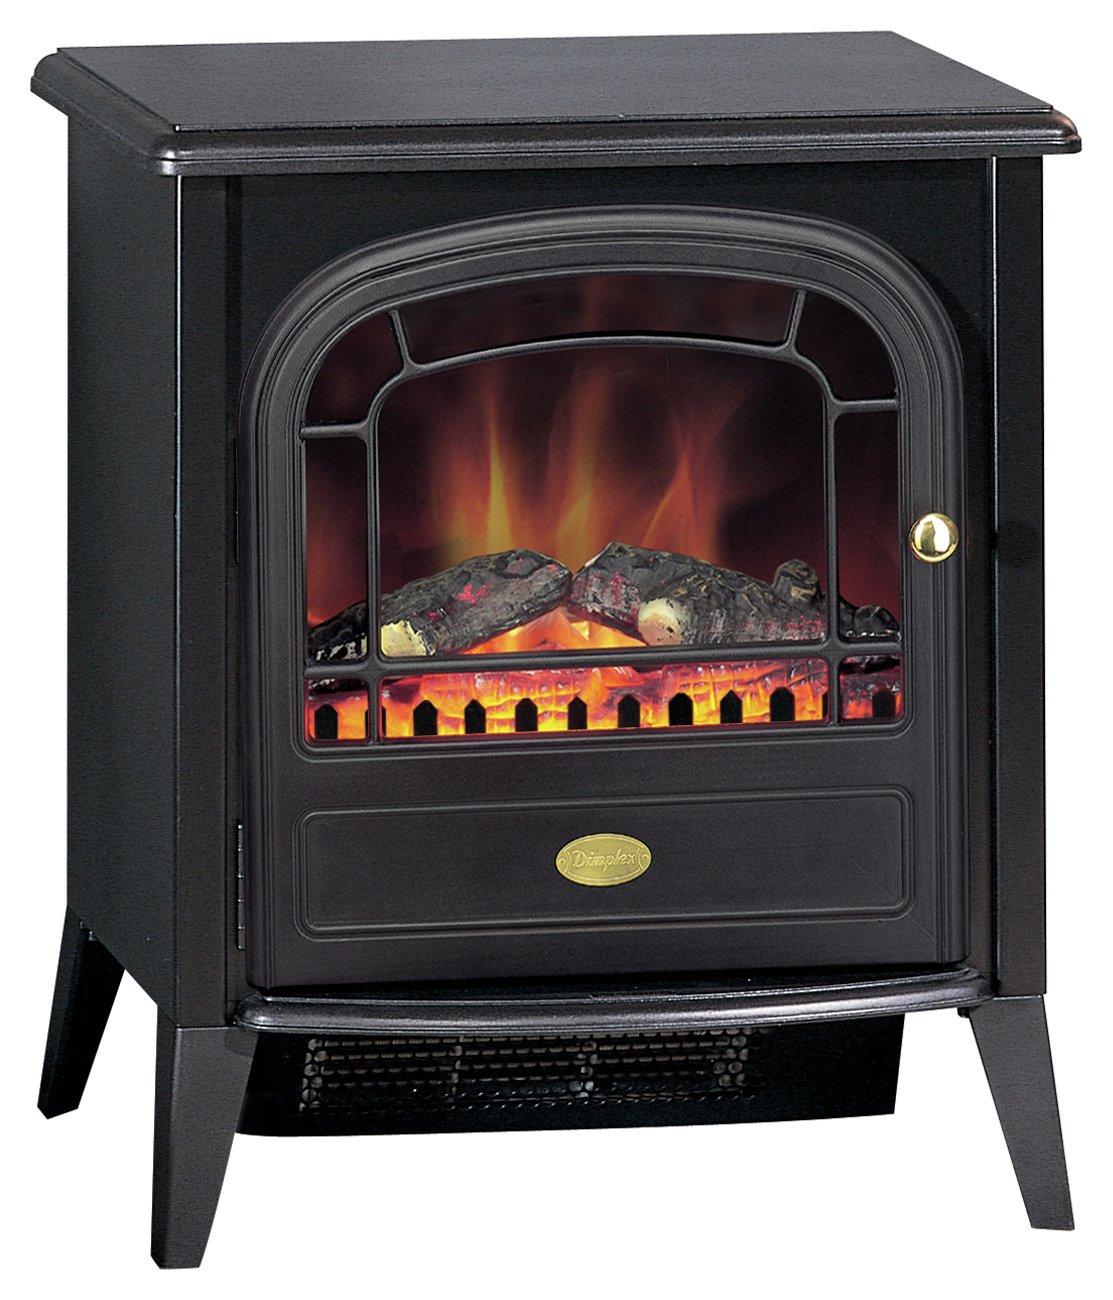 blyss orebro freestanding electric stove. Black Bedroom Furniture Sets. Home Design Ideas